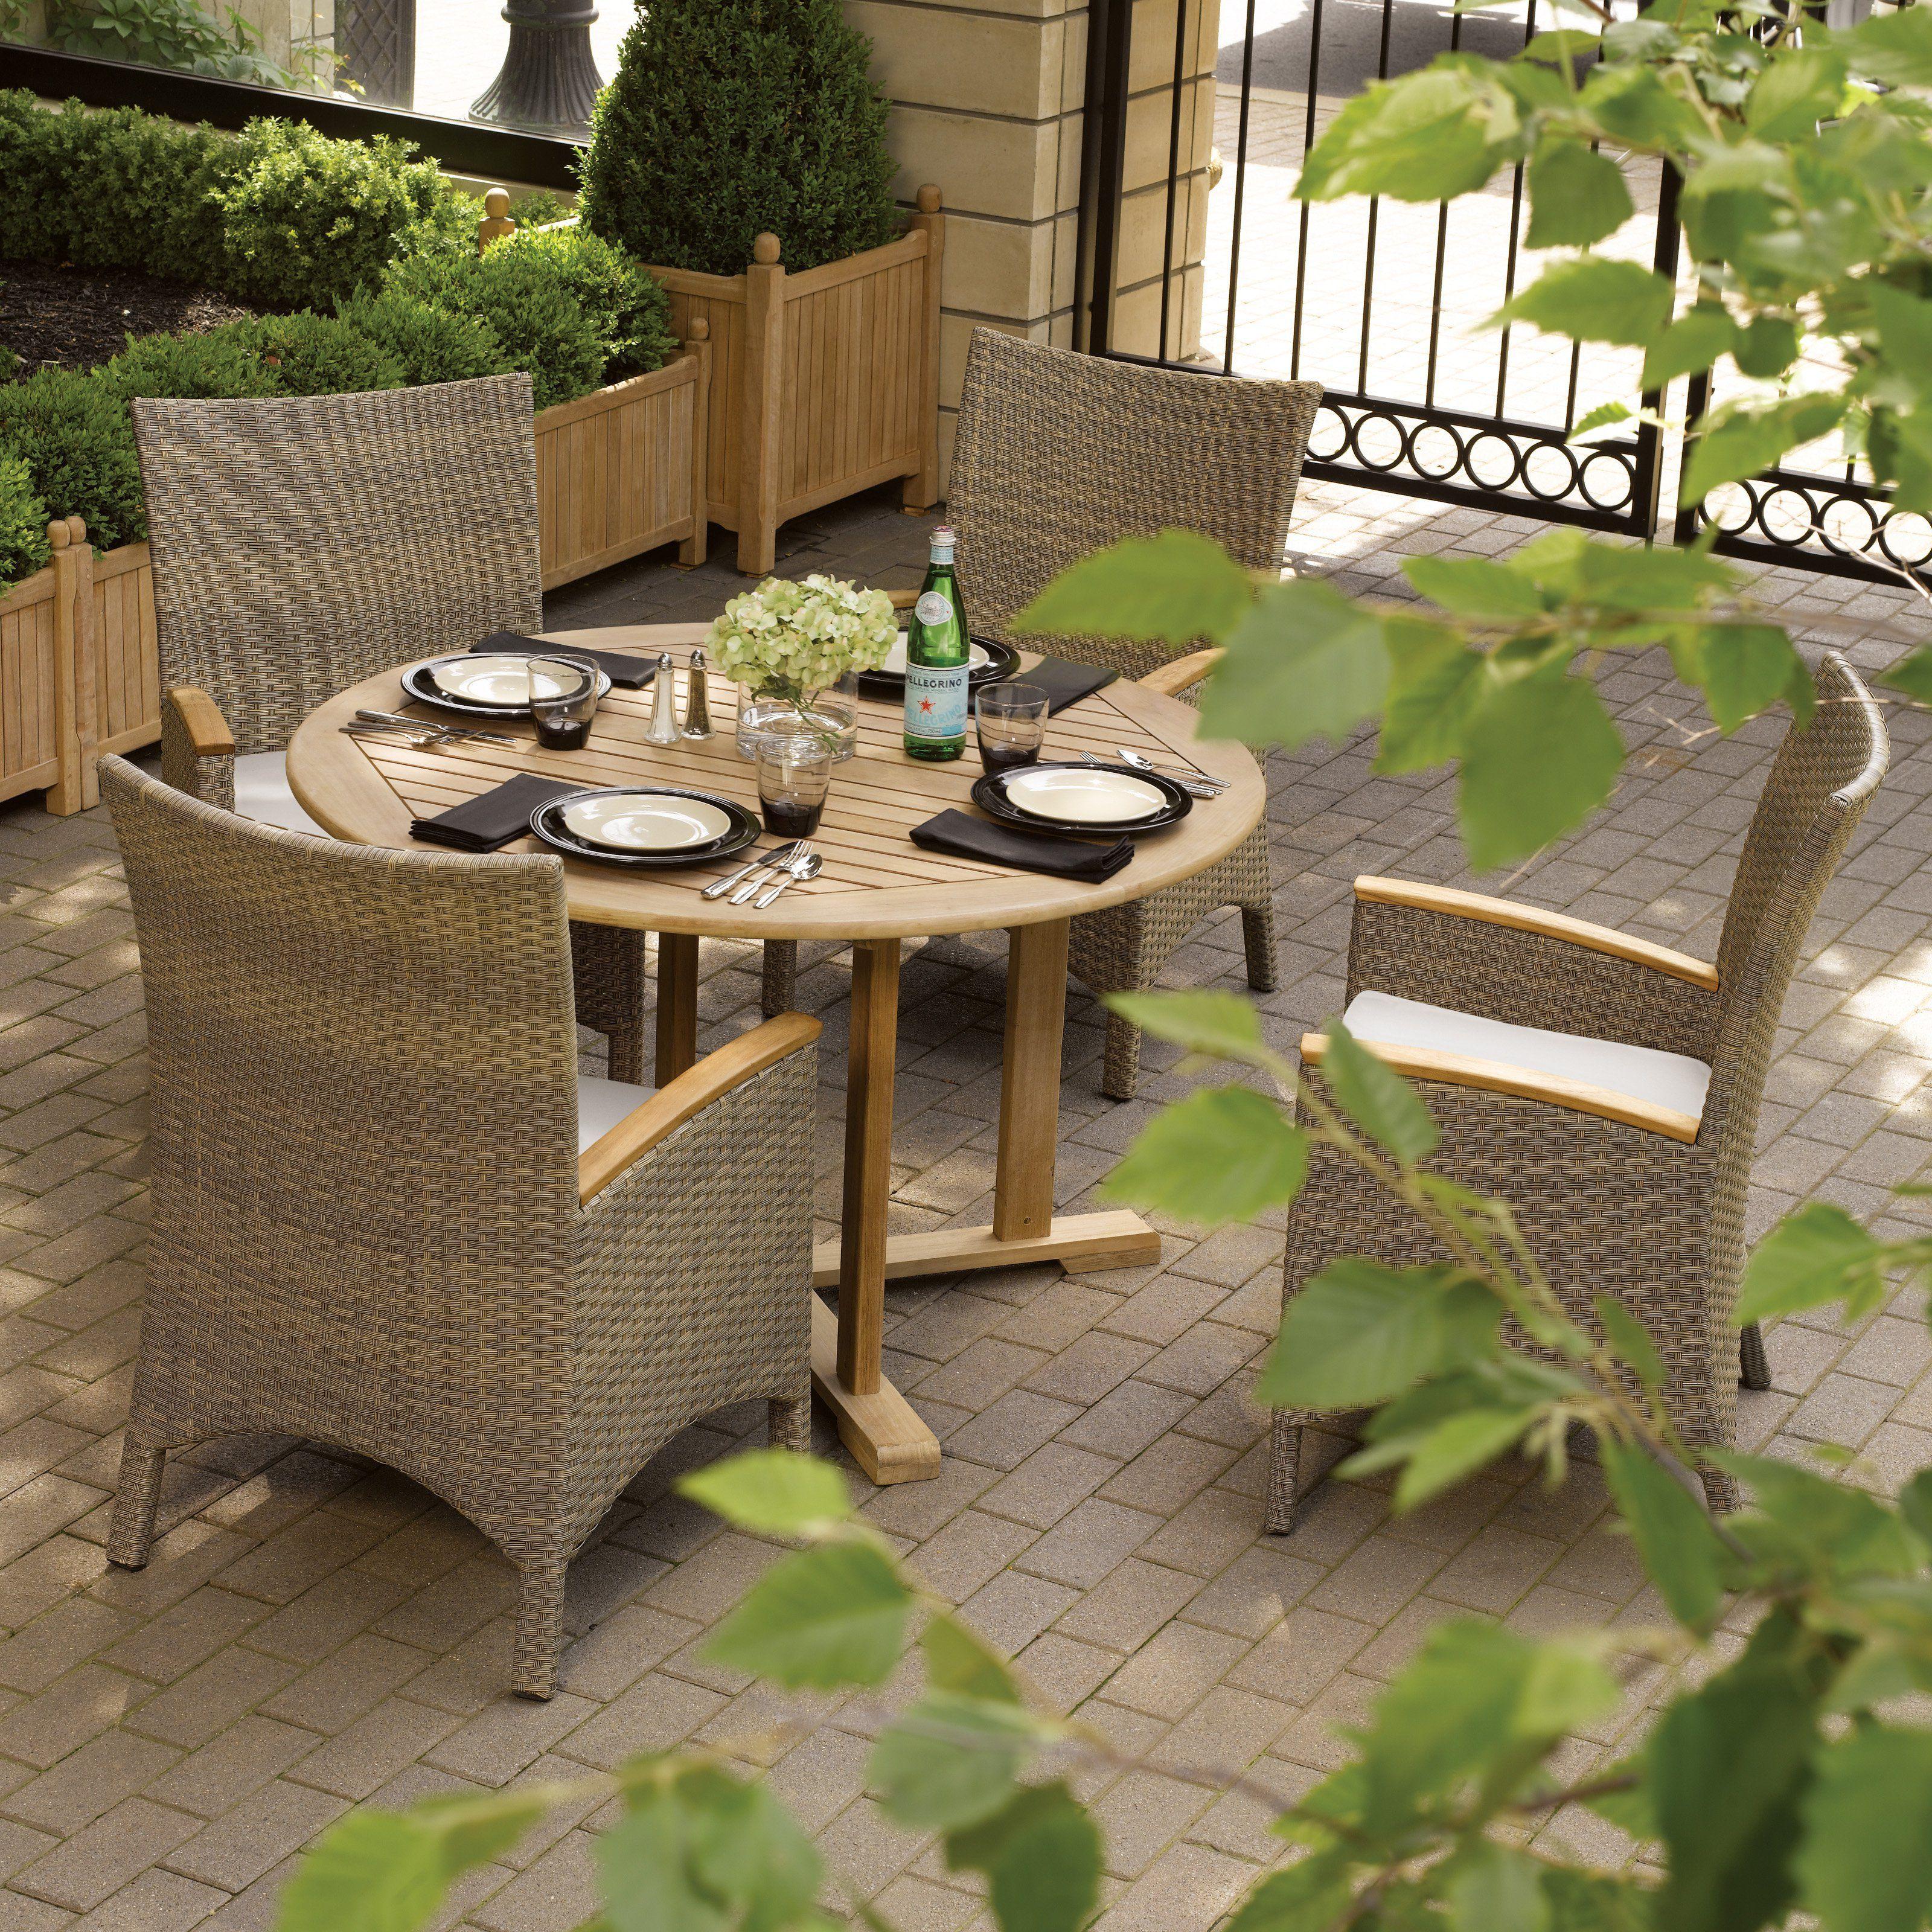 Oxford Garden Torbay Patio Outdoor Wicker Dining Set